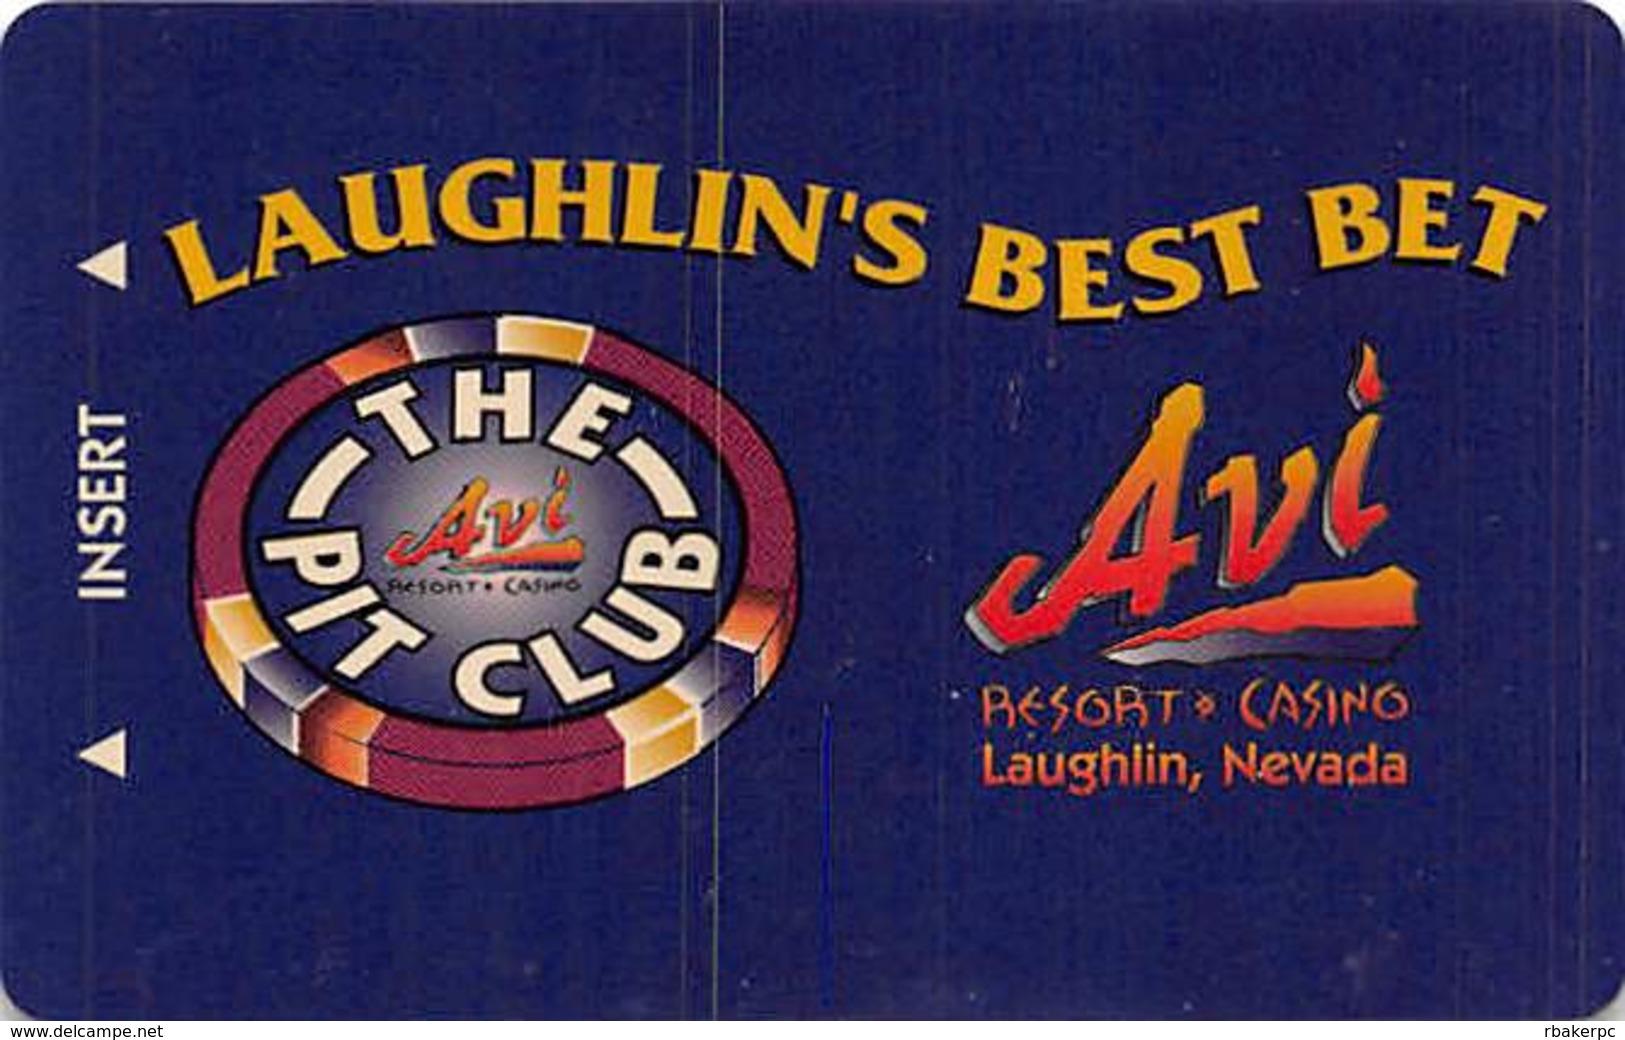 AVI Resort & Casino Laughlin, NV - The Pit Club Slot Card (BLANK) - Casino Cards